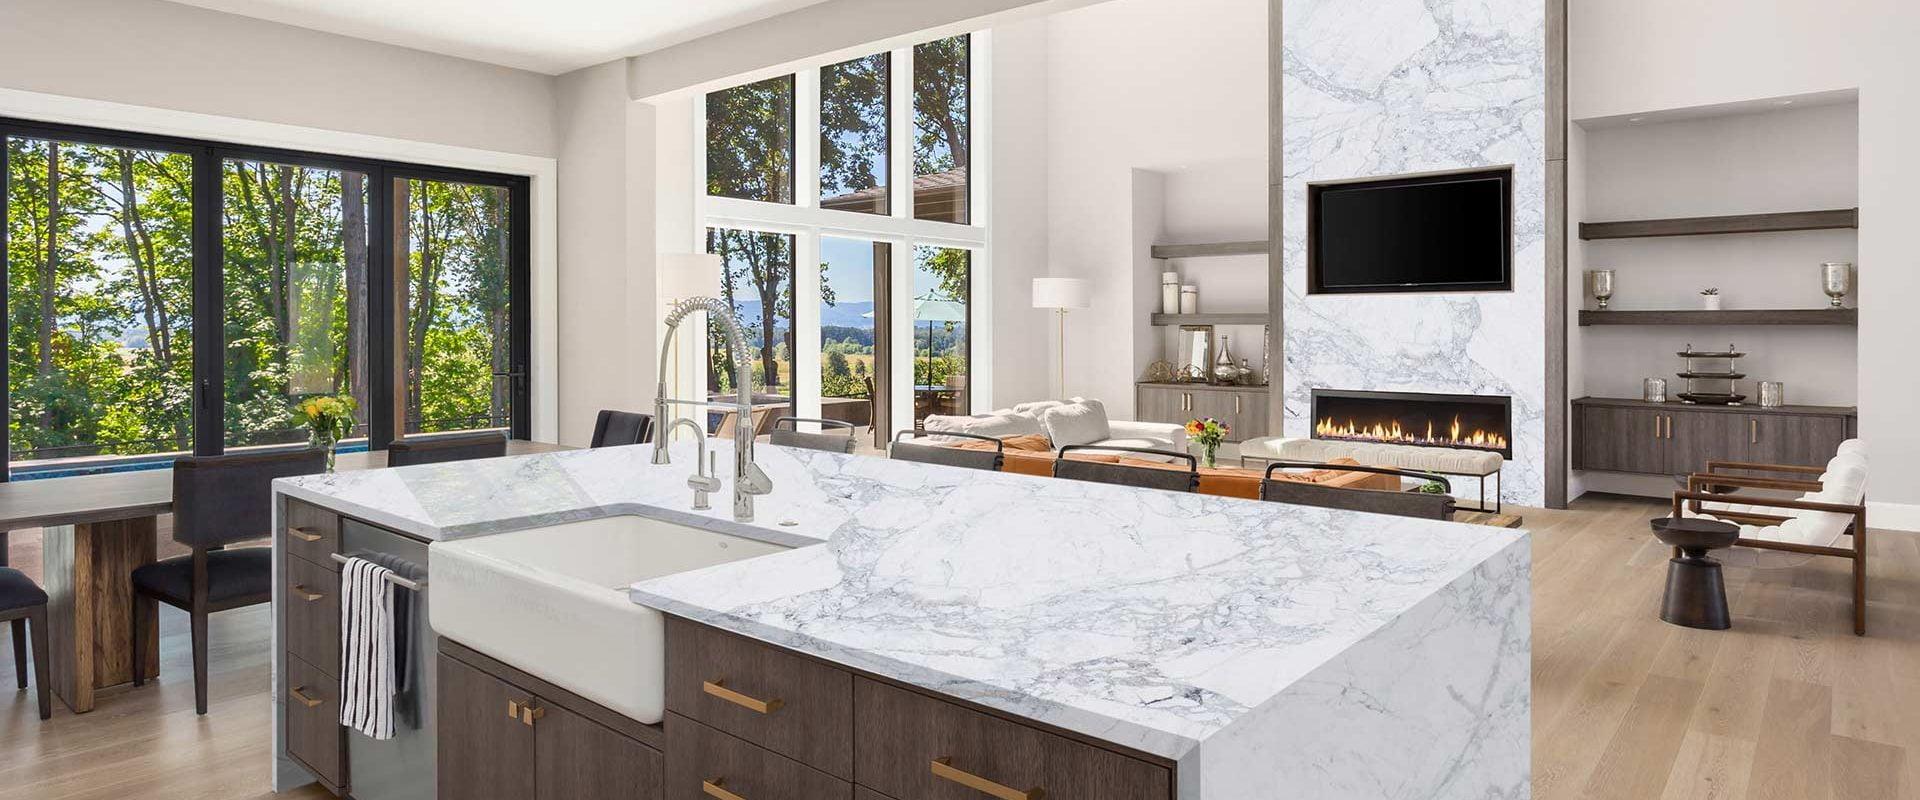 cozinha-Michelangelo-120404